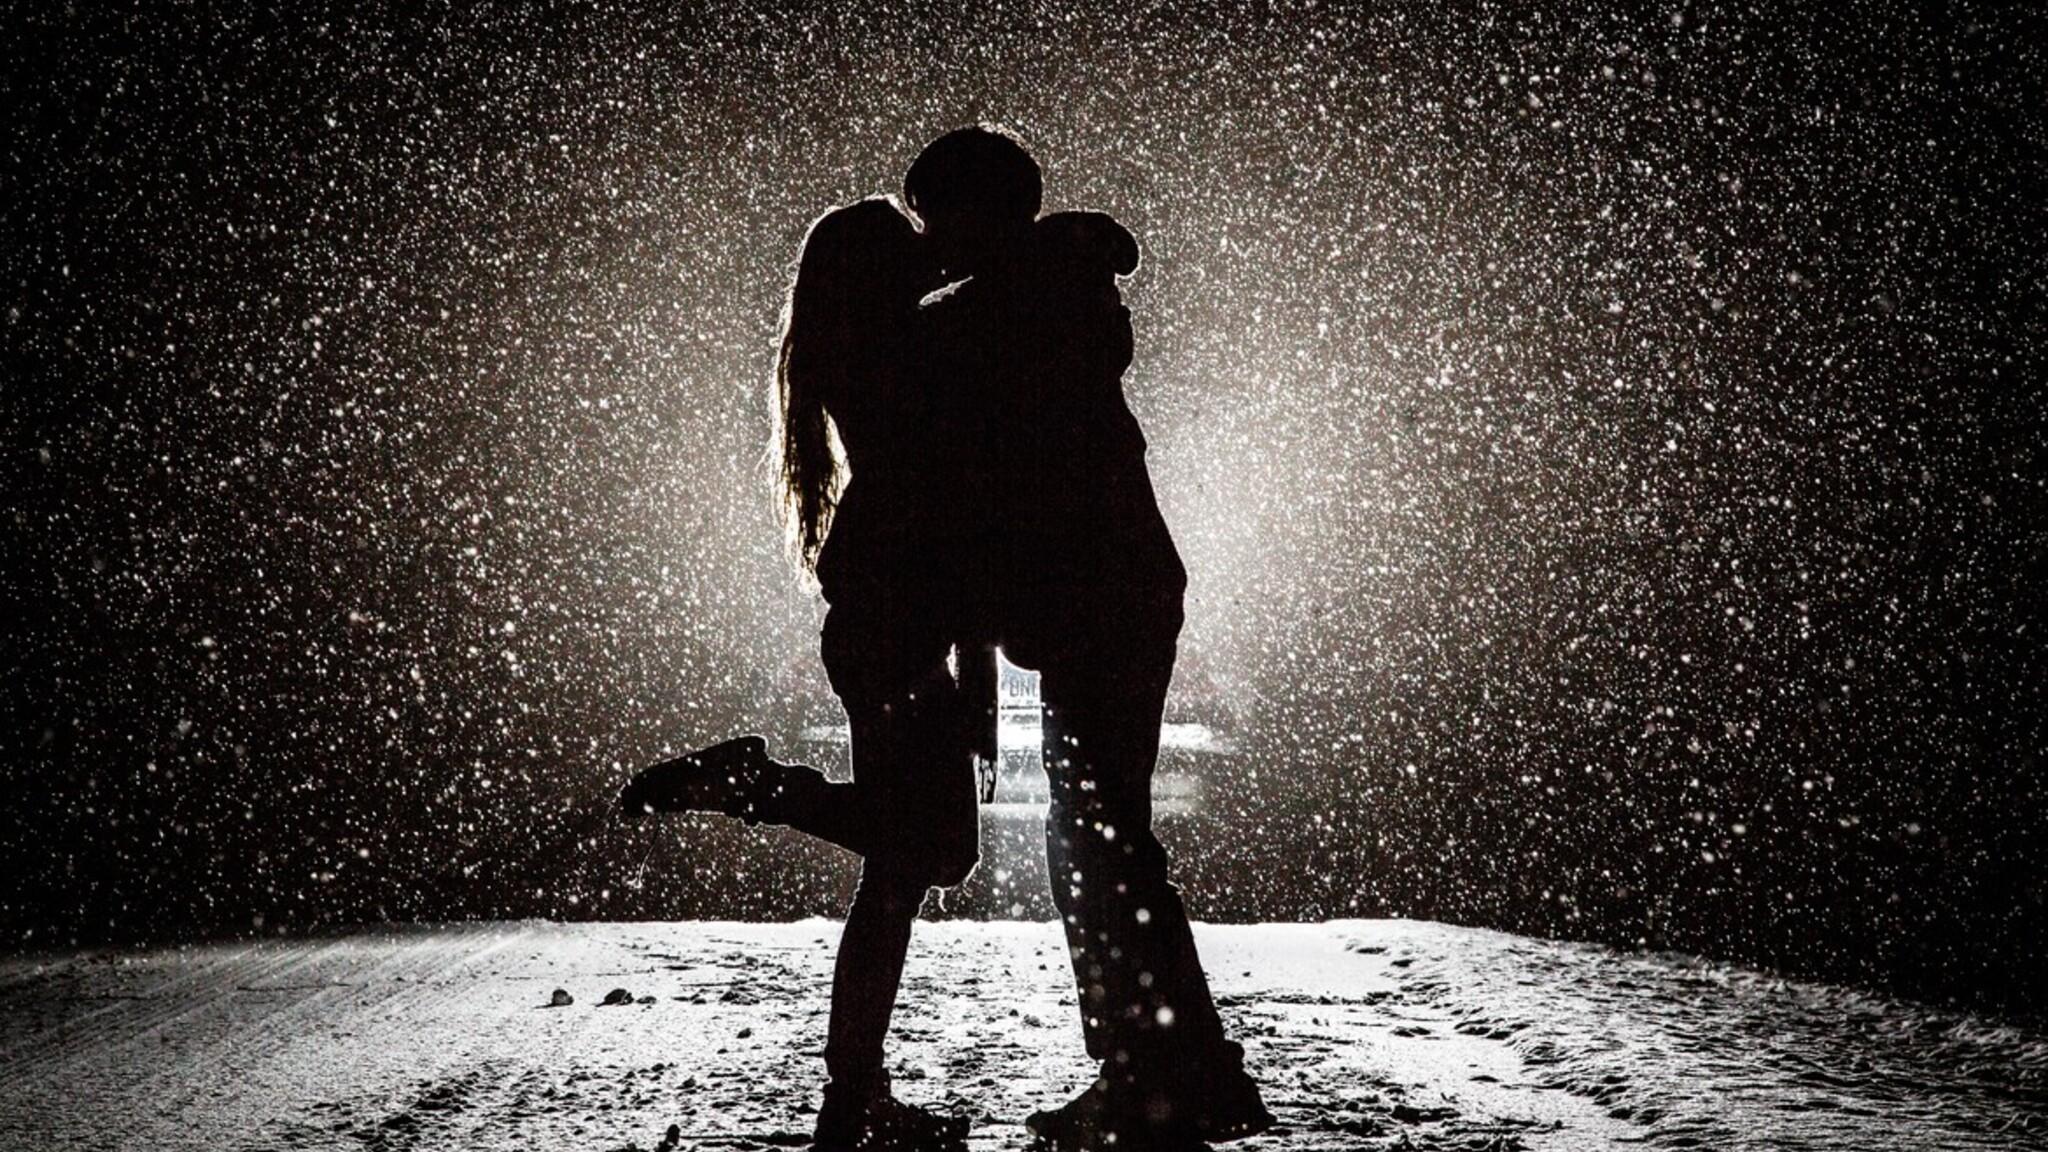 2048x1152 couple kissing in snow night 2048x1152 - 4k kiss wallpaper ...